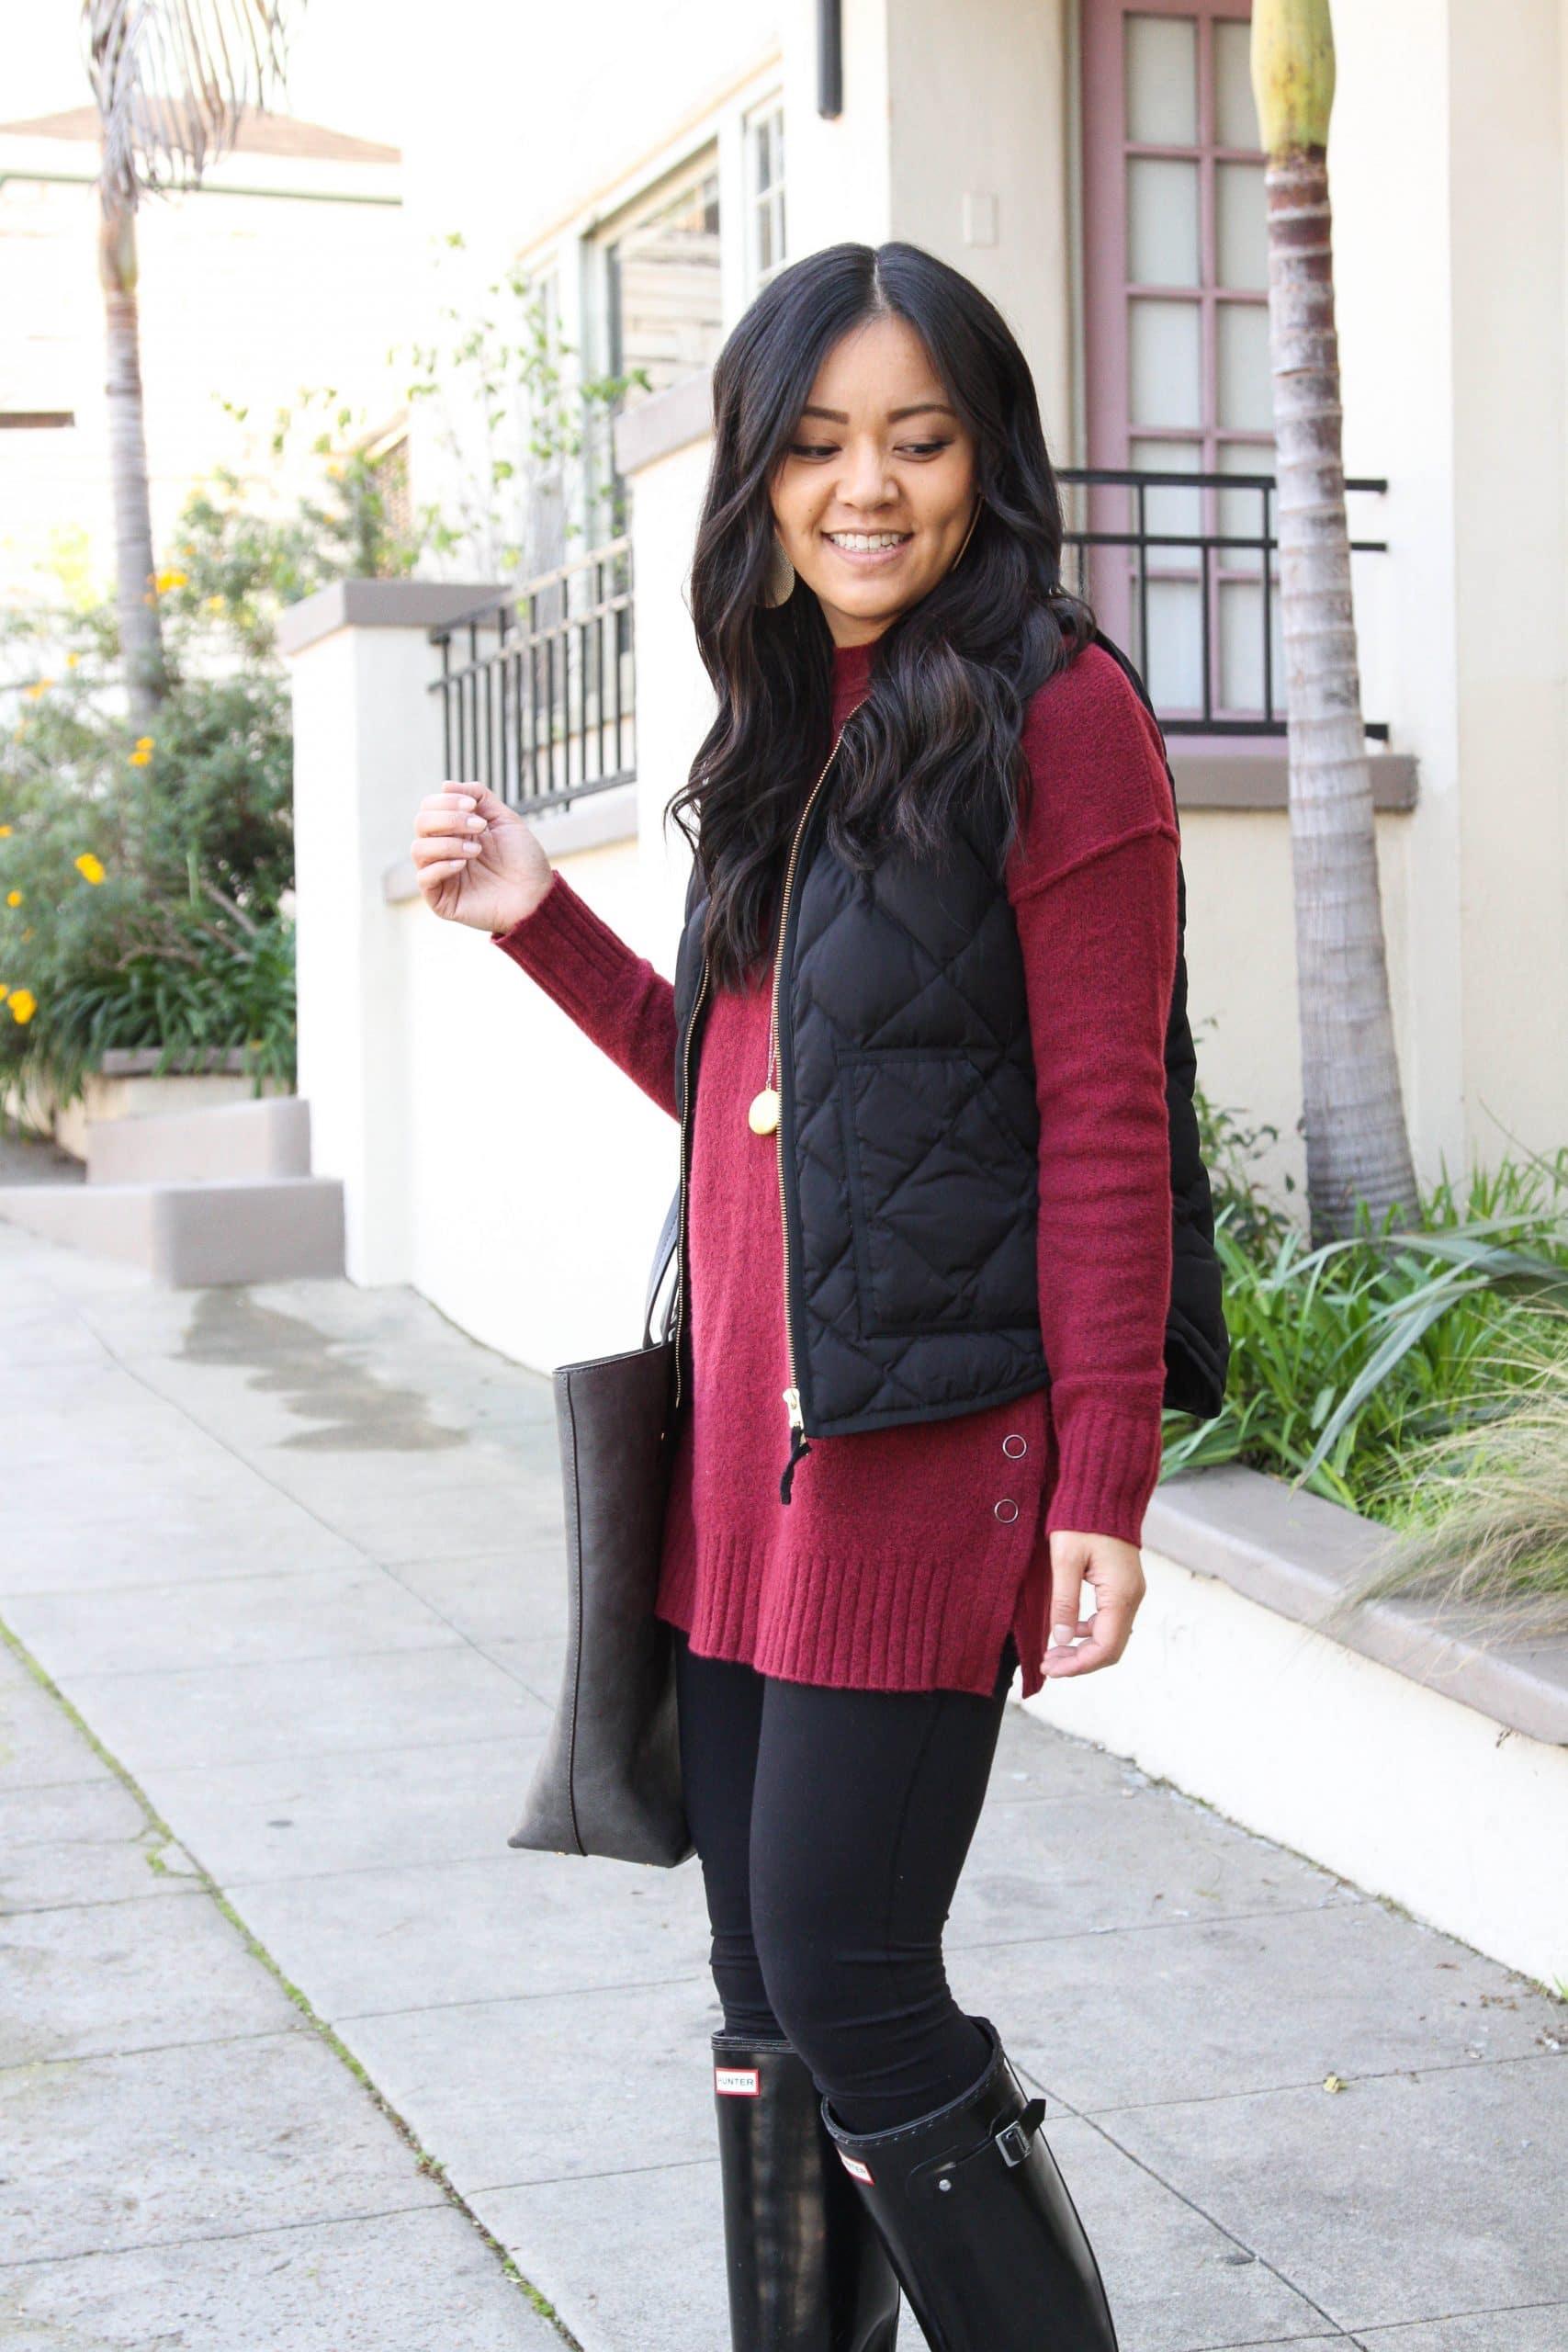 Maroon sweater + black leggings + black vest + black rain boots